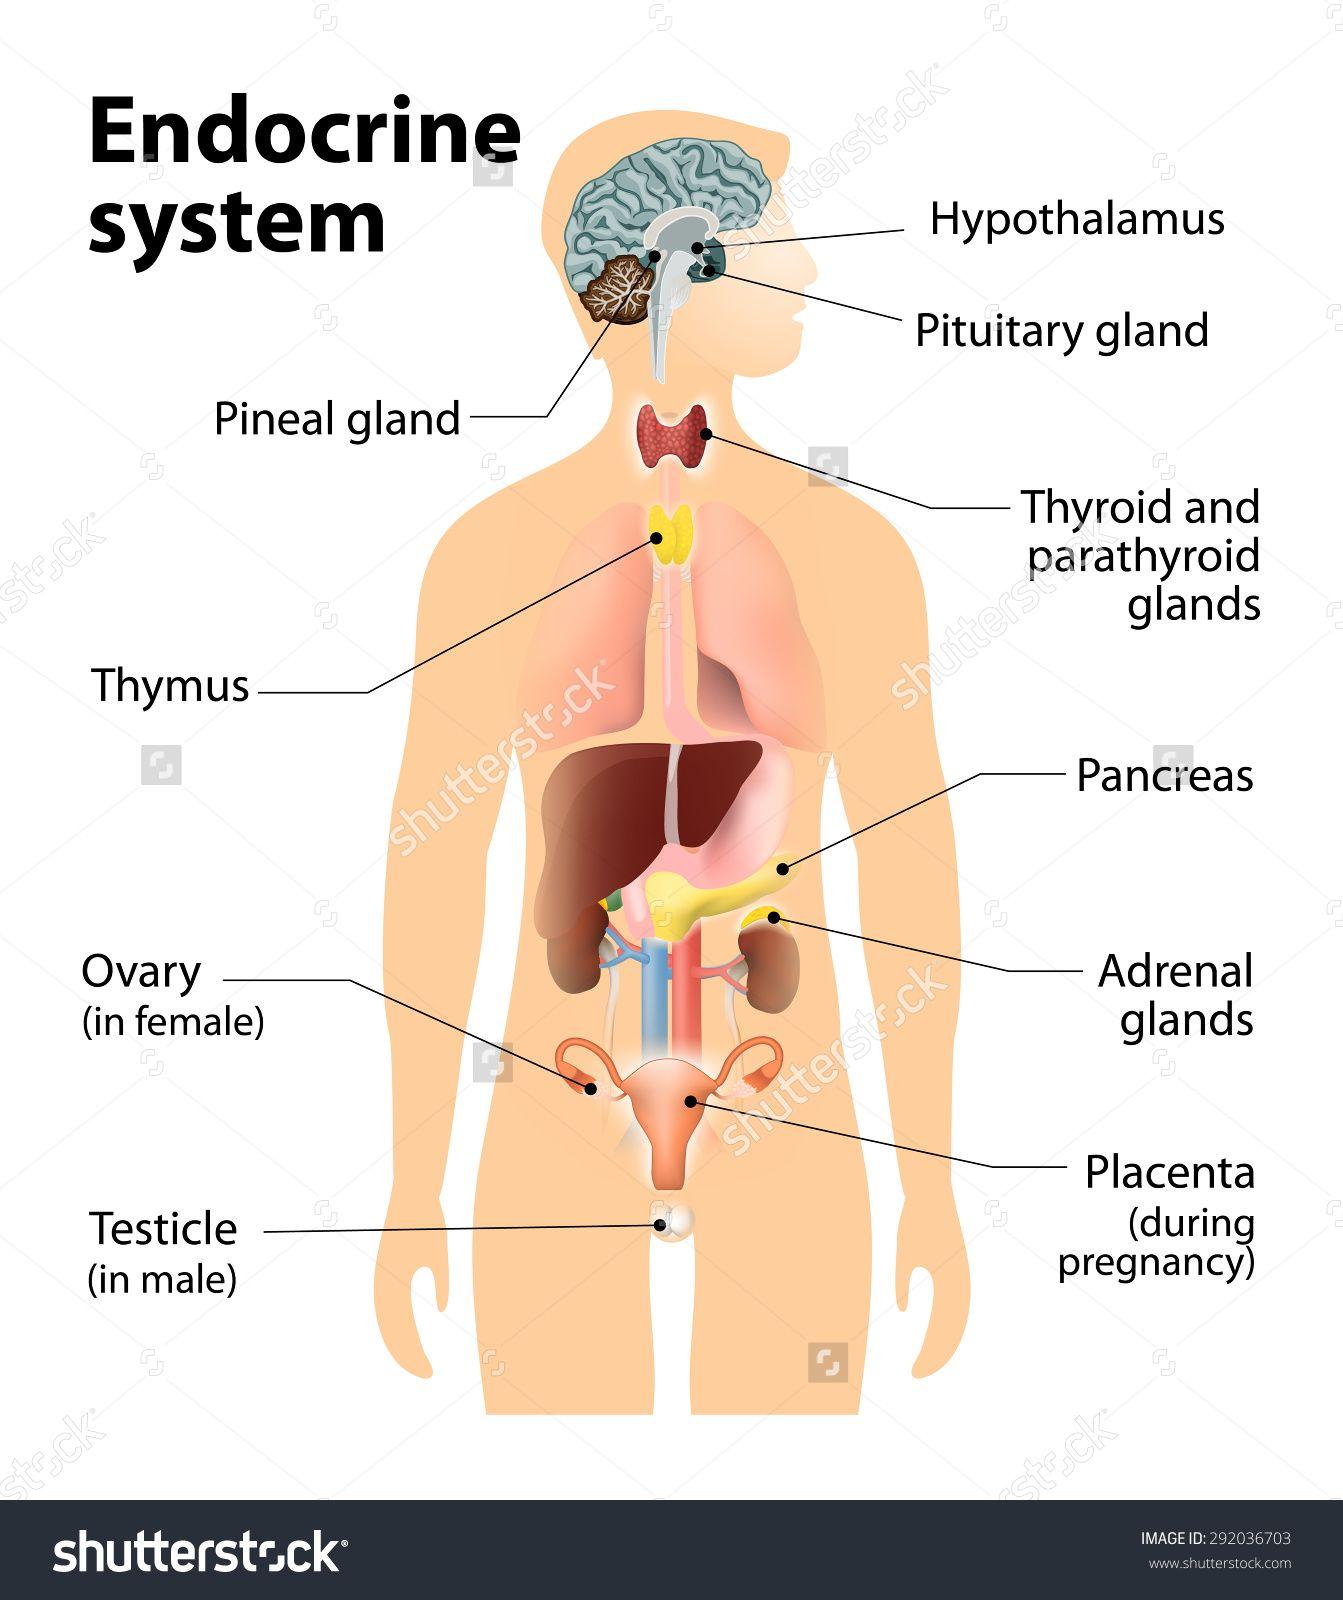 Endocrine System Highlighting Internal Organs Anatomy